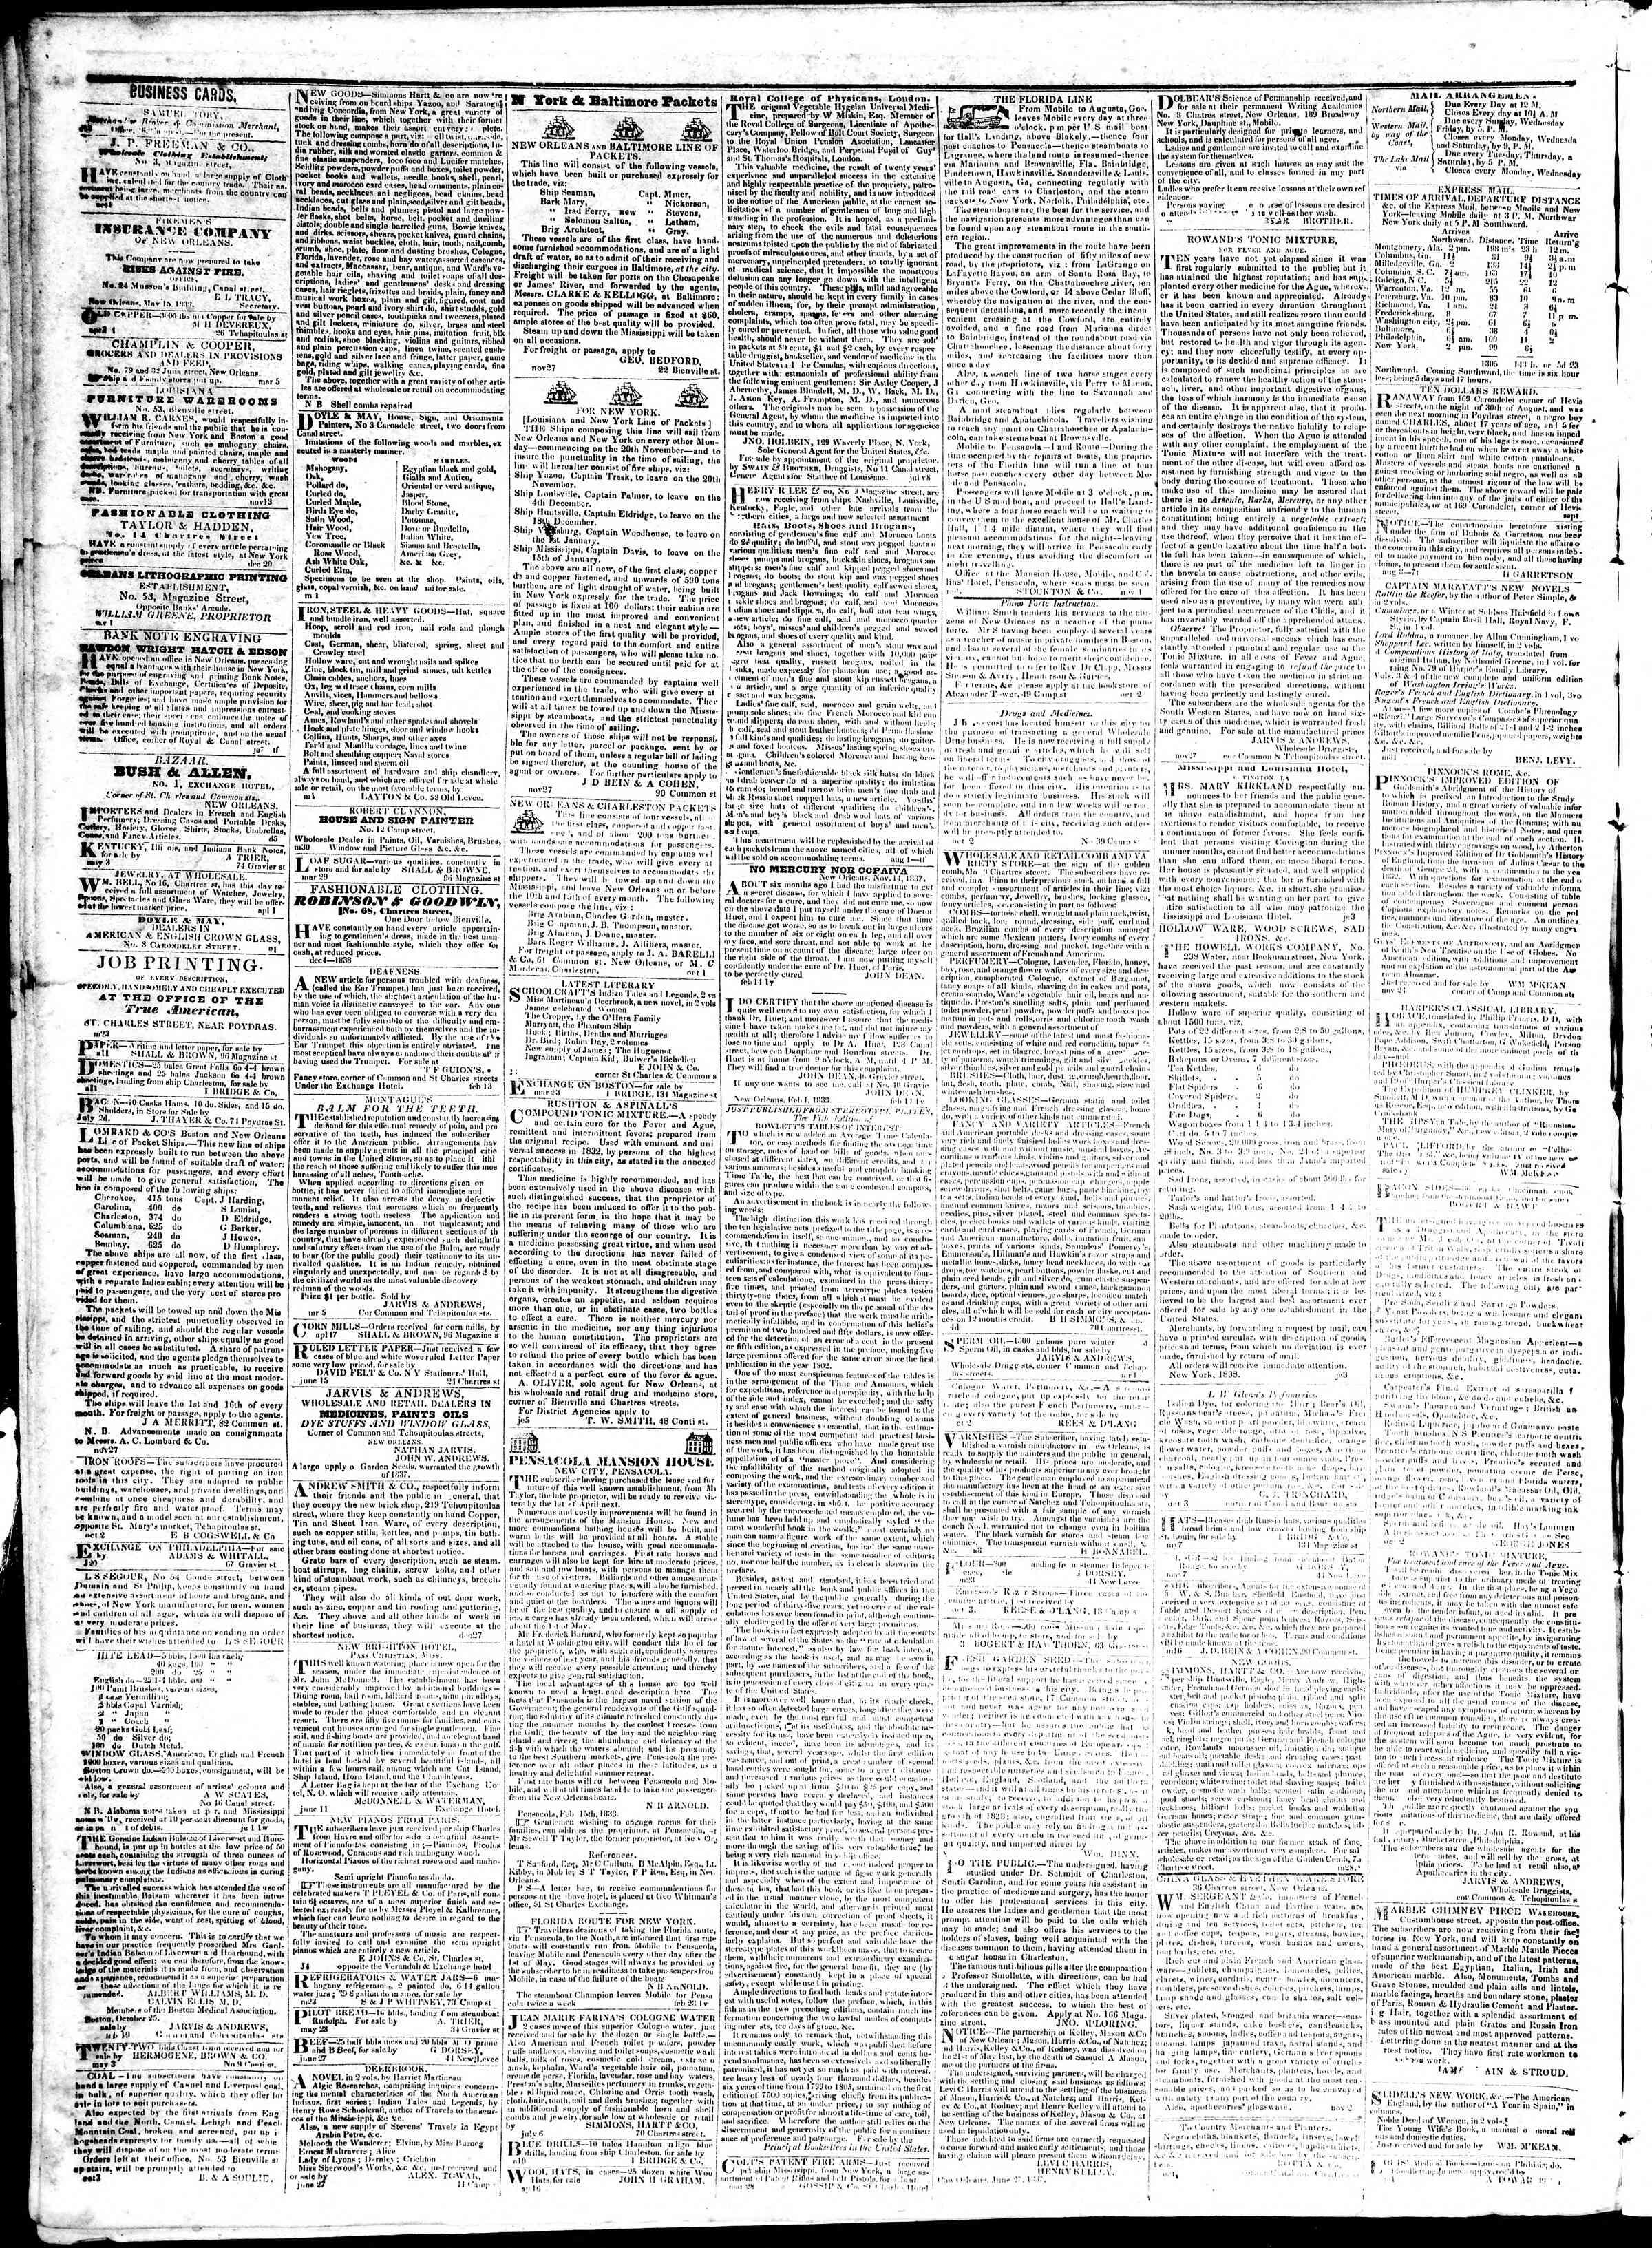 September 3, 1839 Tarihli True American Gazetesi Sayfa 4